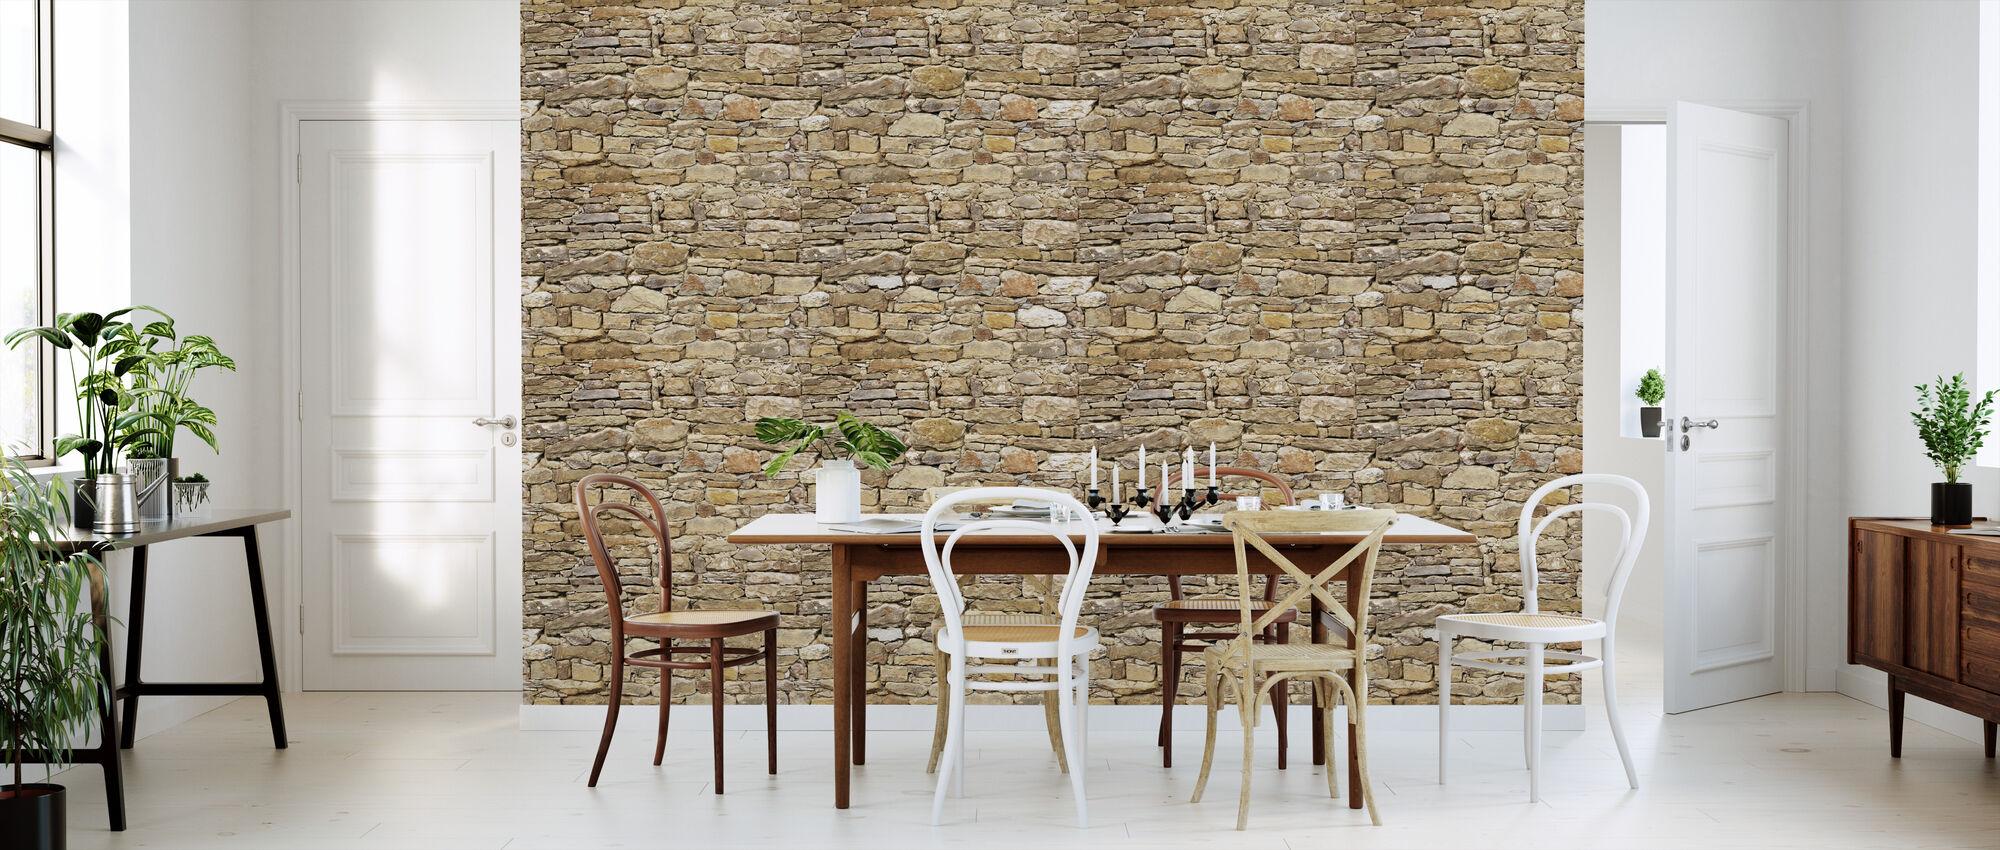 Rustik stenmur - Tapet - Kök